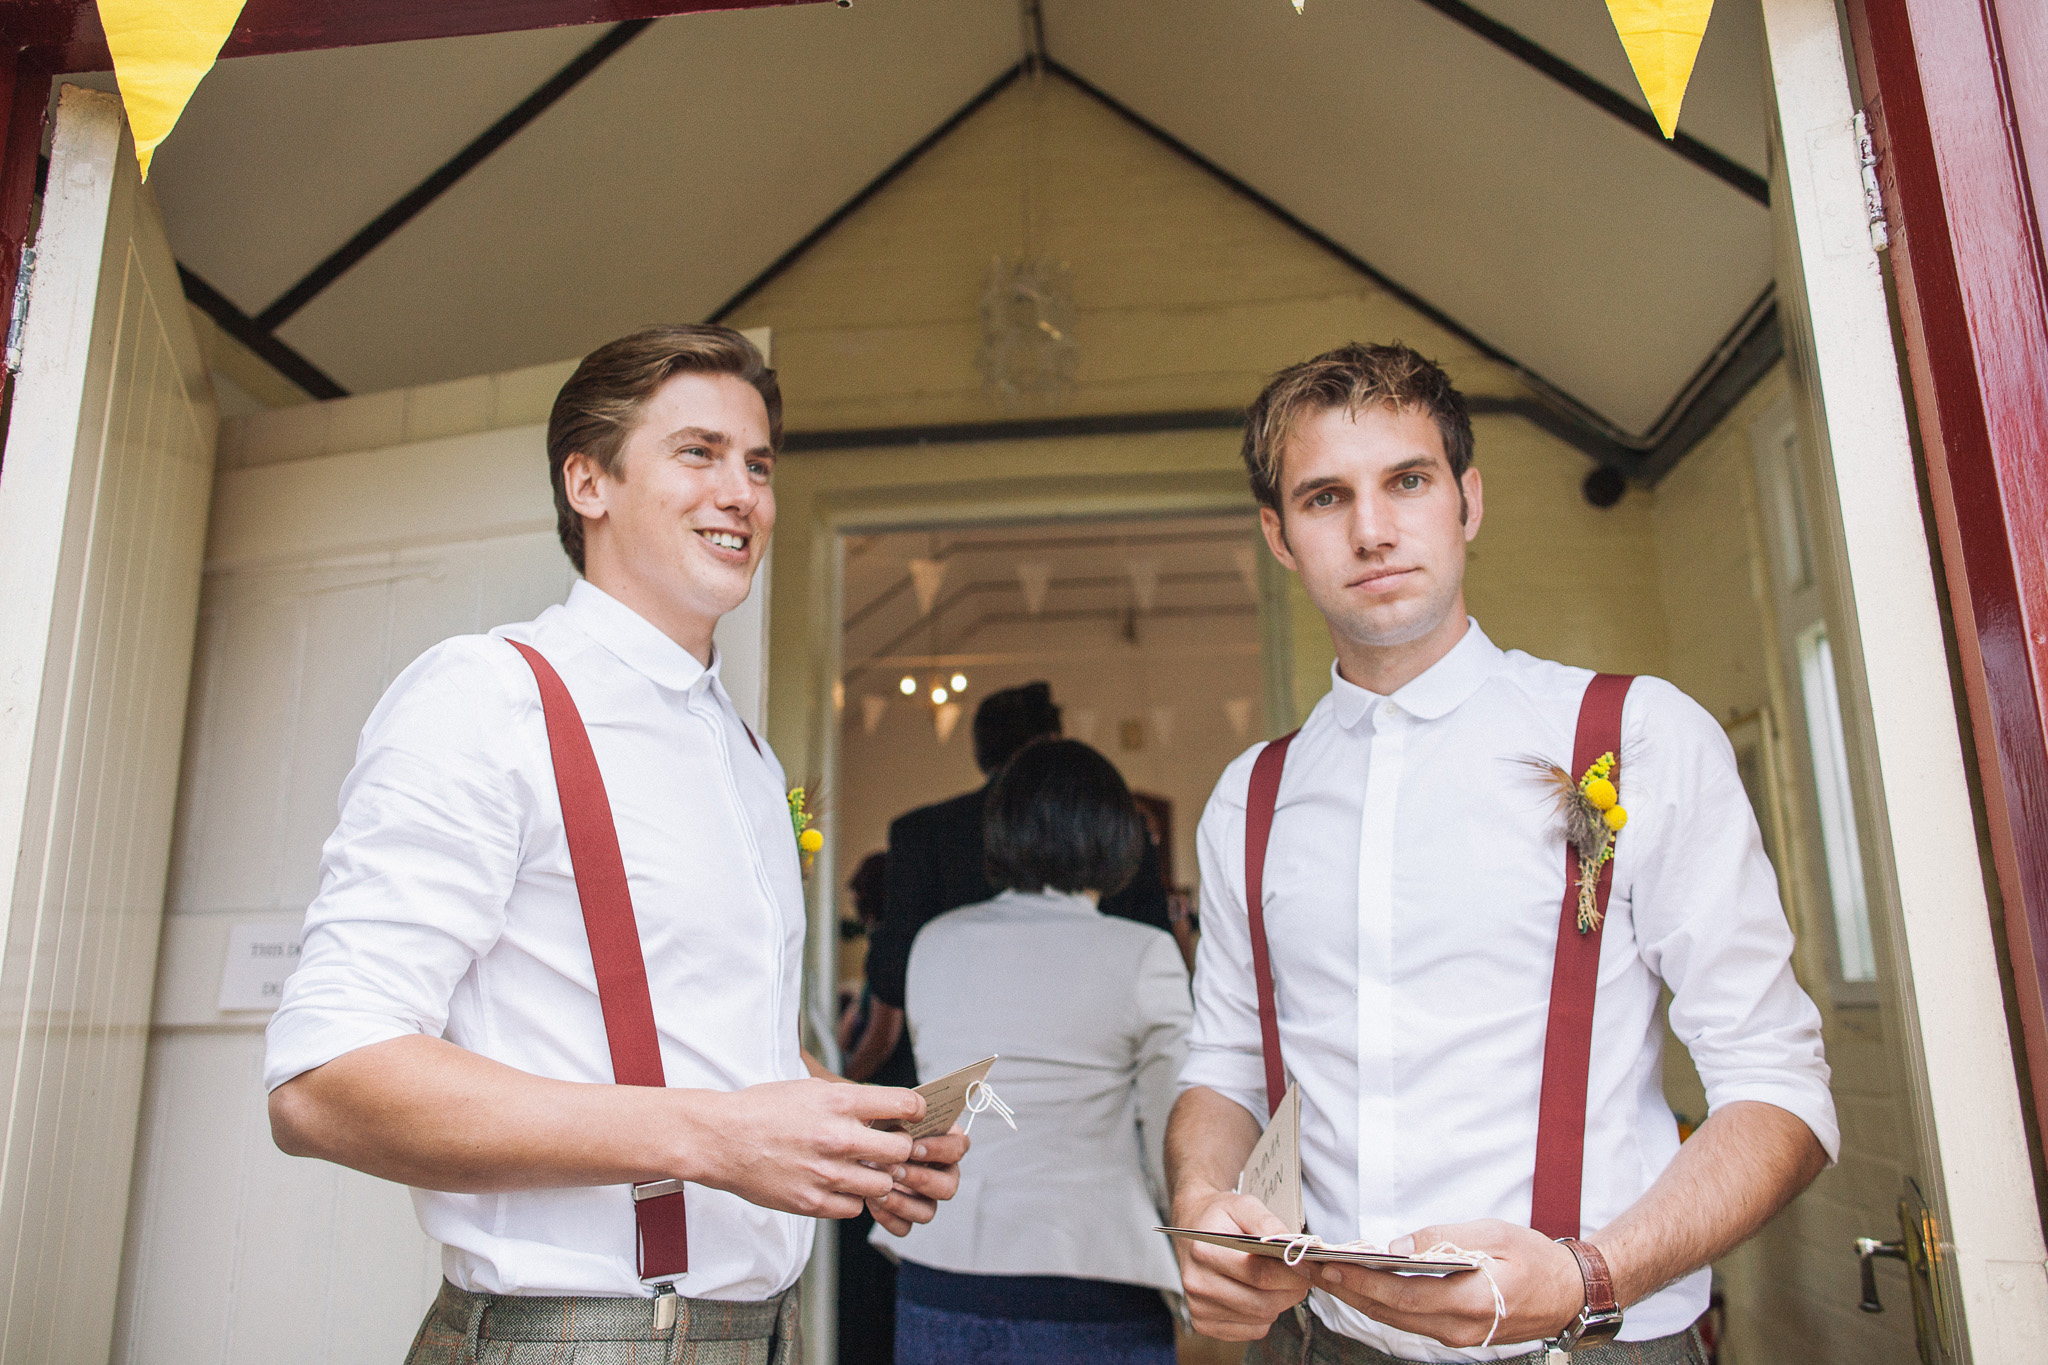 chantry_sussex_barn_wedding_301.jpg